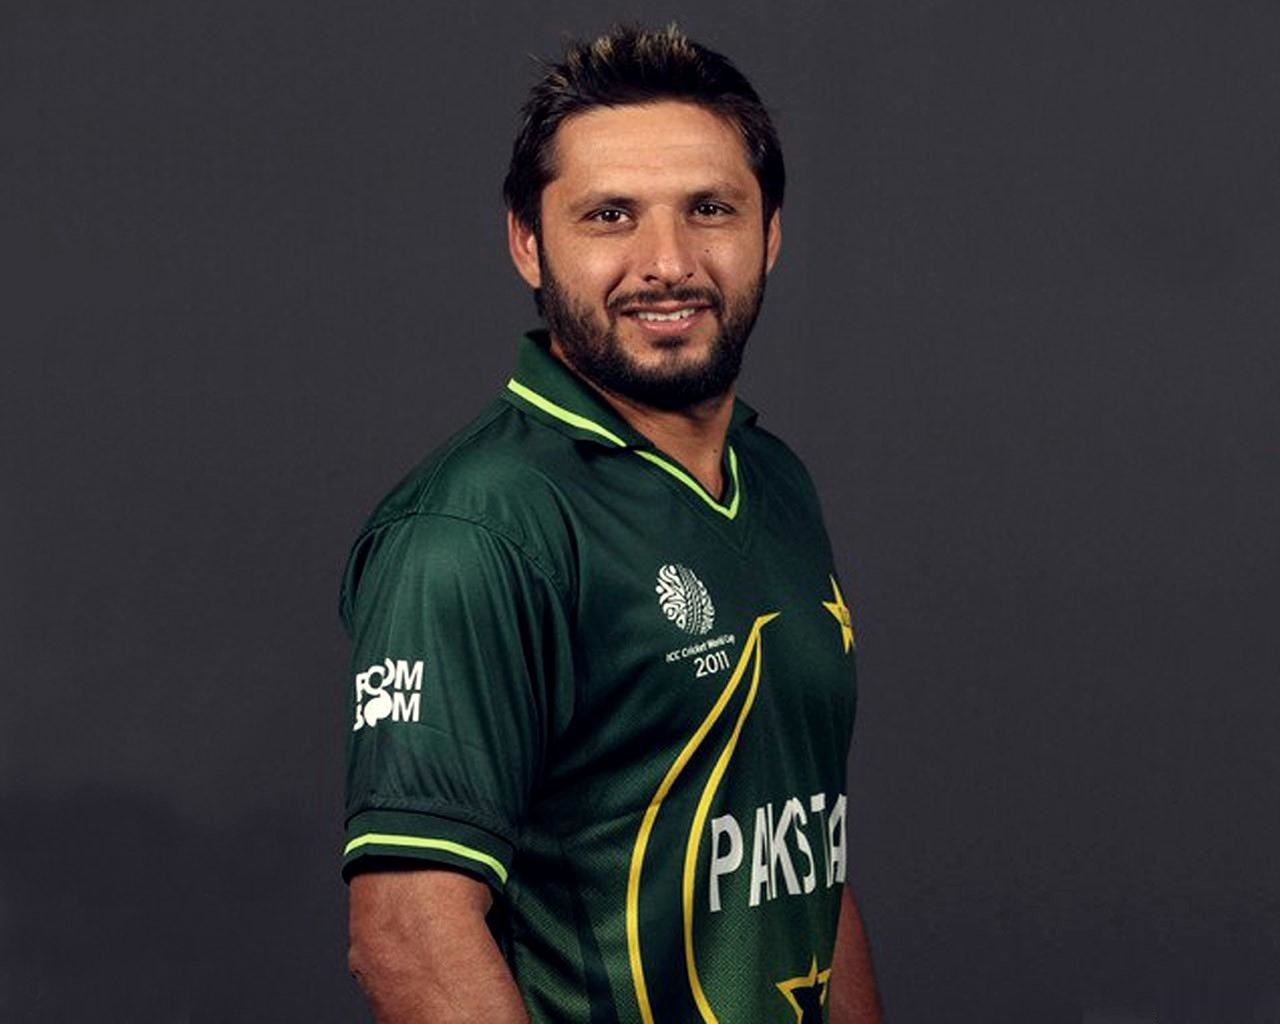 Cricketer Shahid Afridi - age: 40